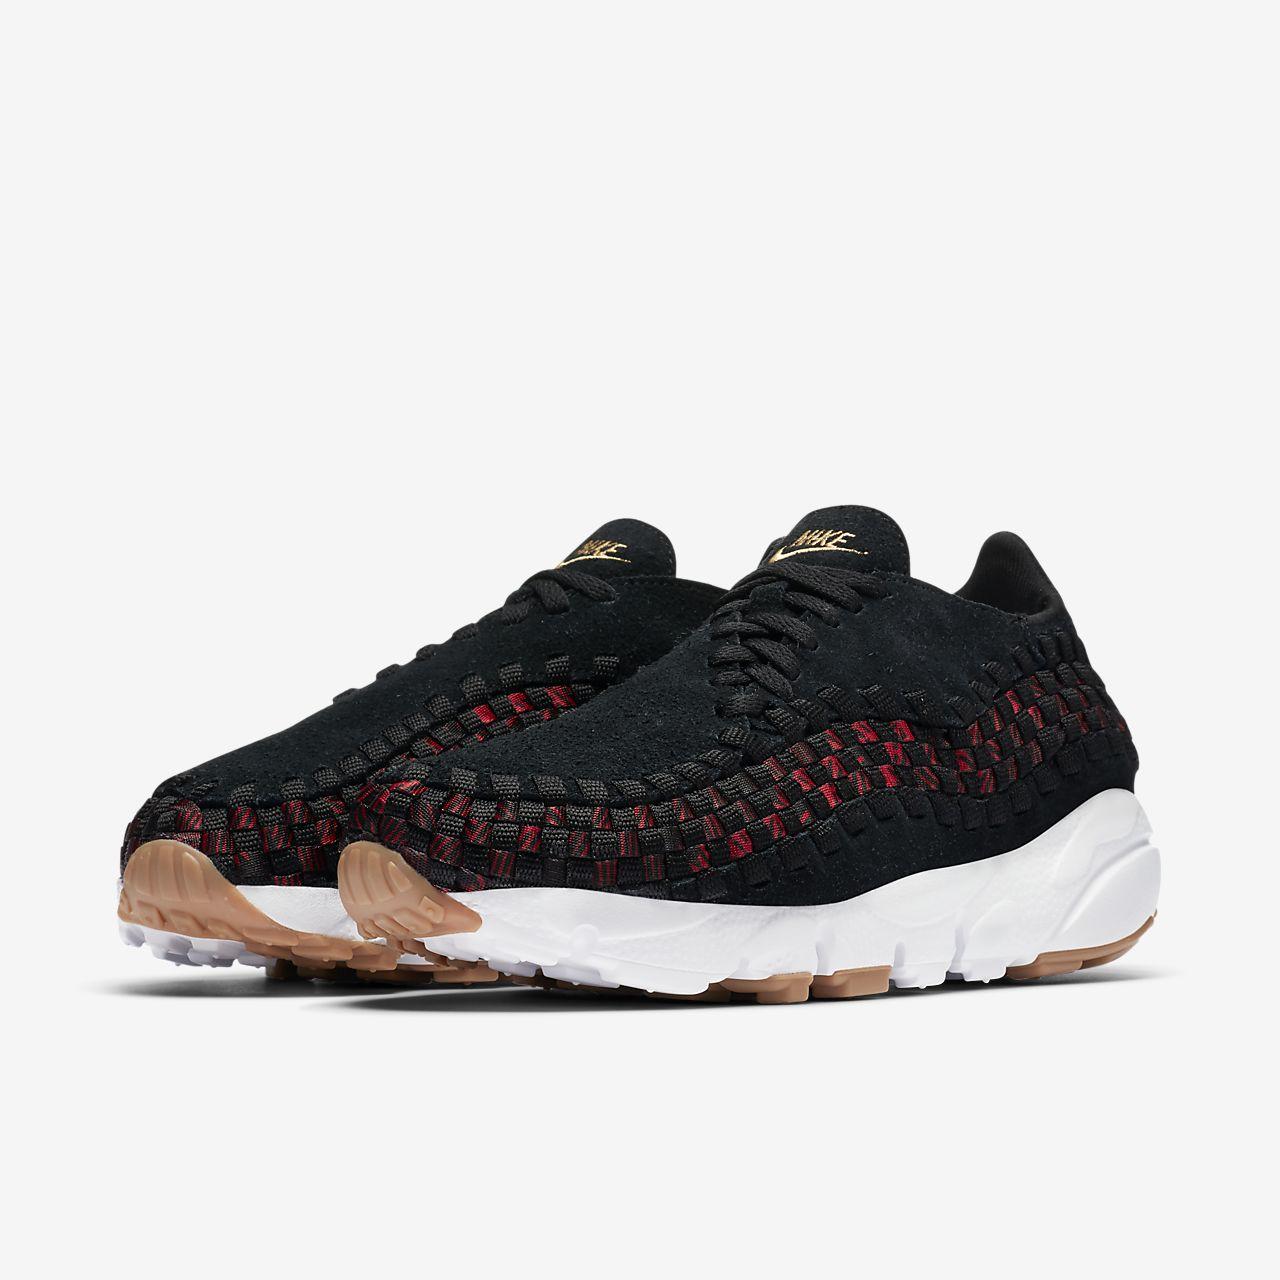 ... Nike Air Footscape N7 Women's Shoe